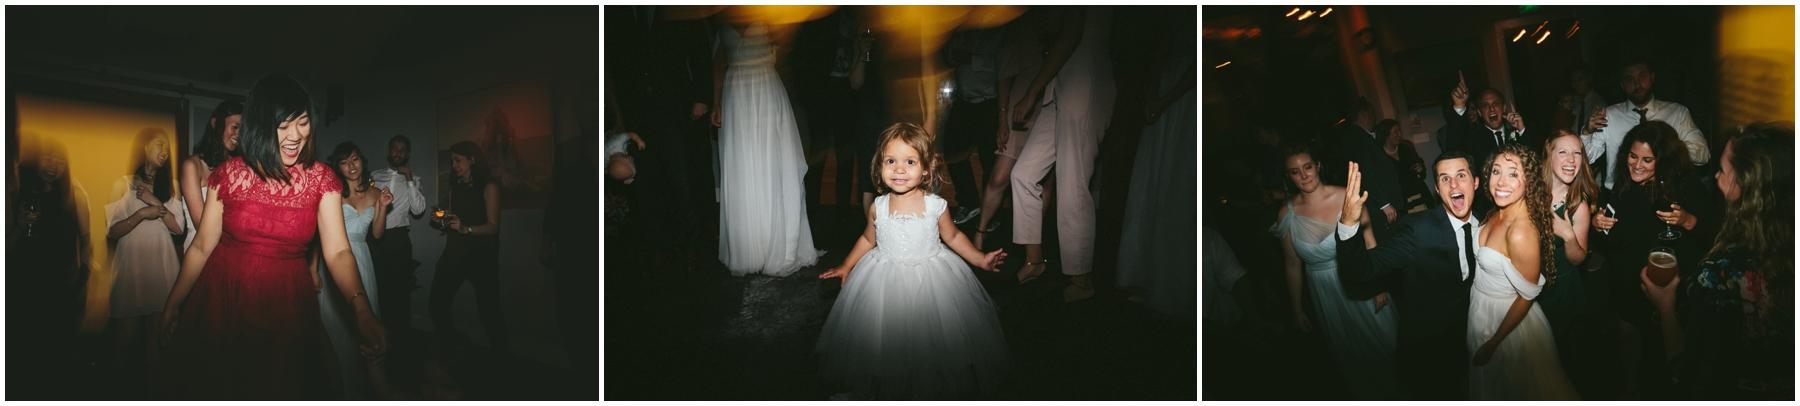 Emily+Paul-WEDDING_KellyBoitanoPhotography_0162